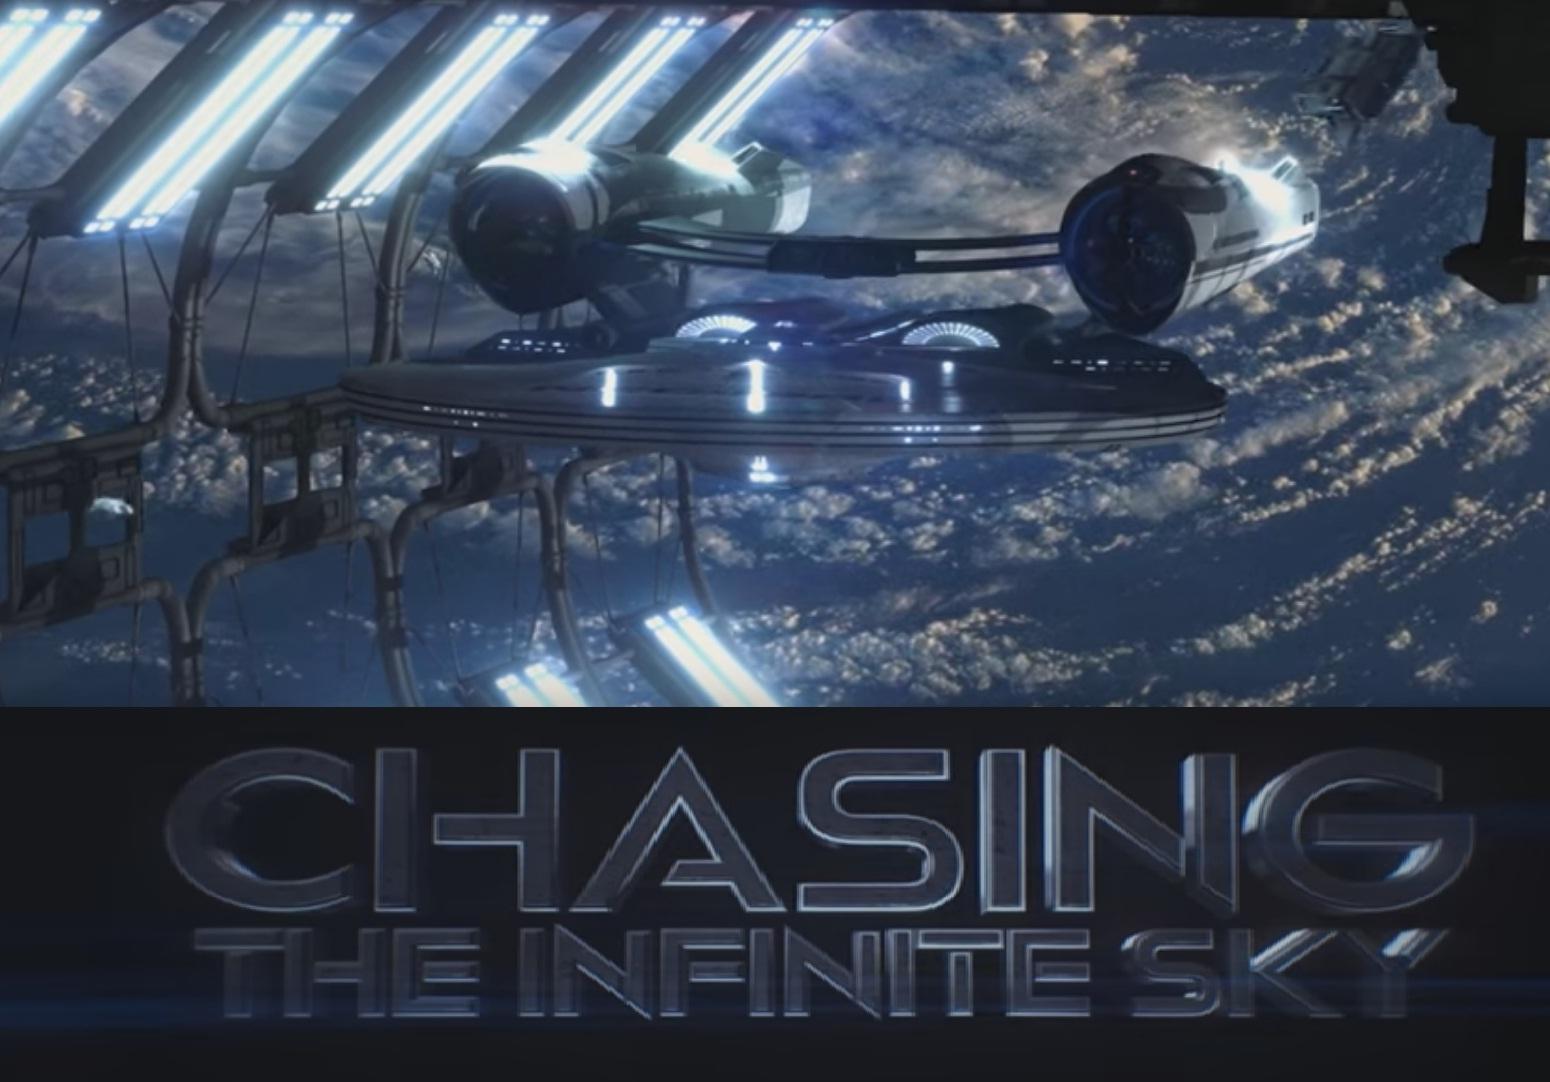 Chasing the Infinite Sky image